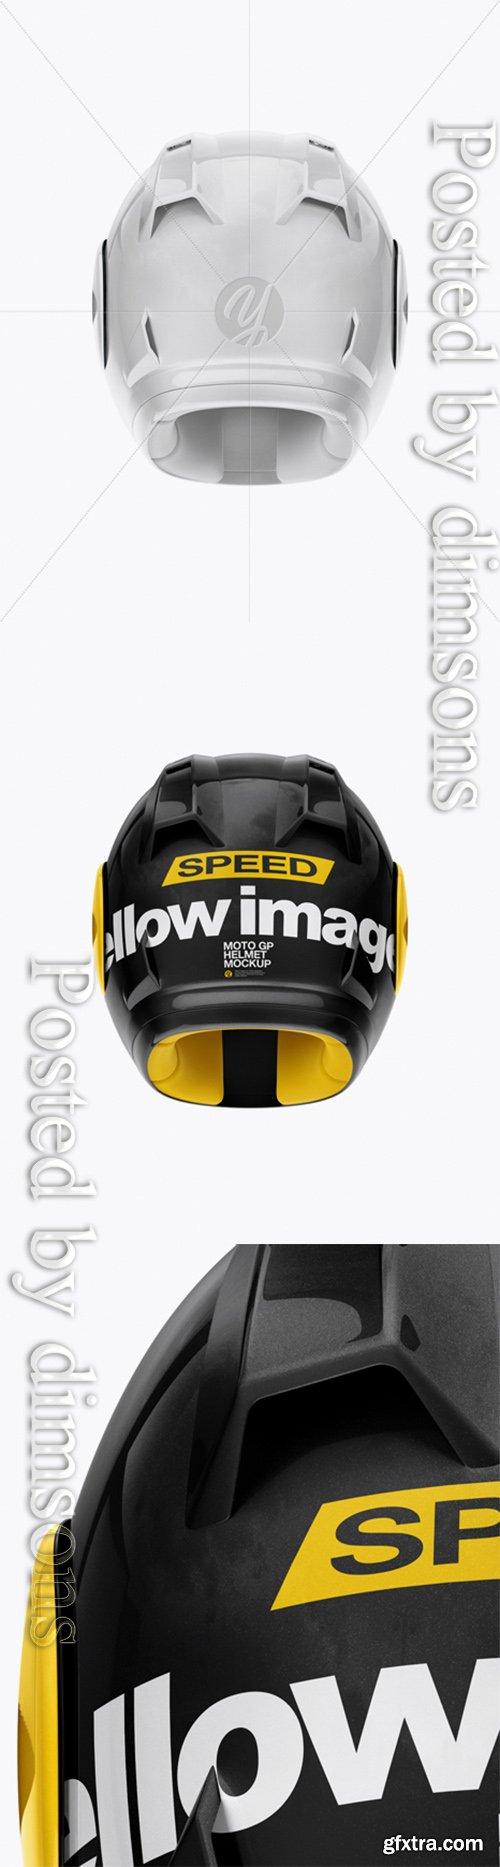 Moto GP Helmet Mockup - Back View 24952